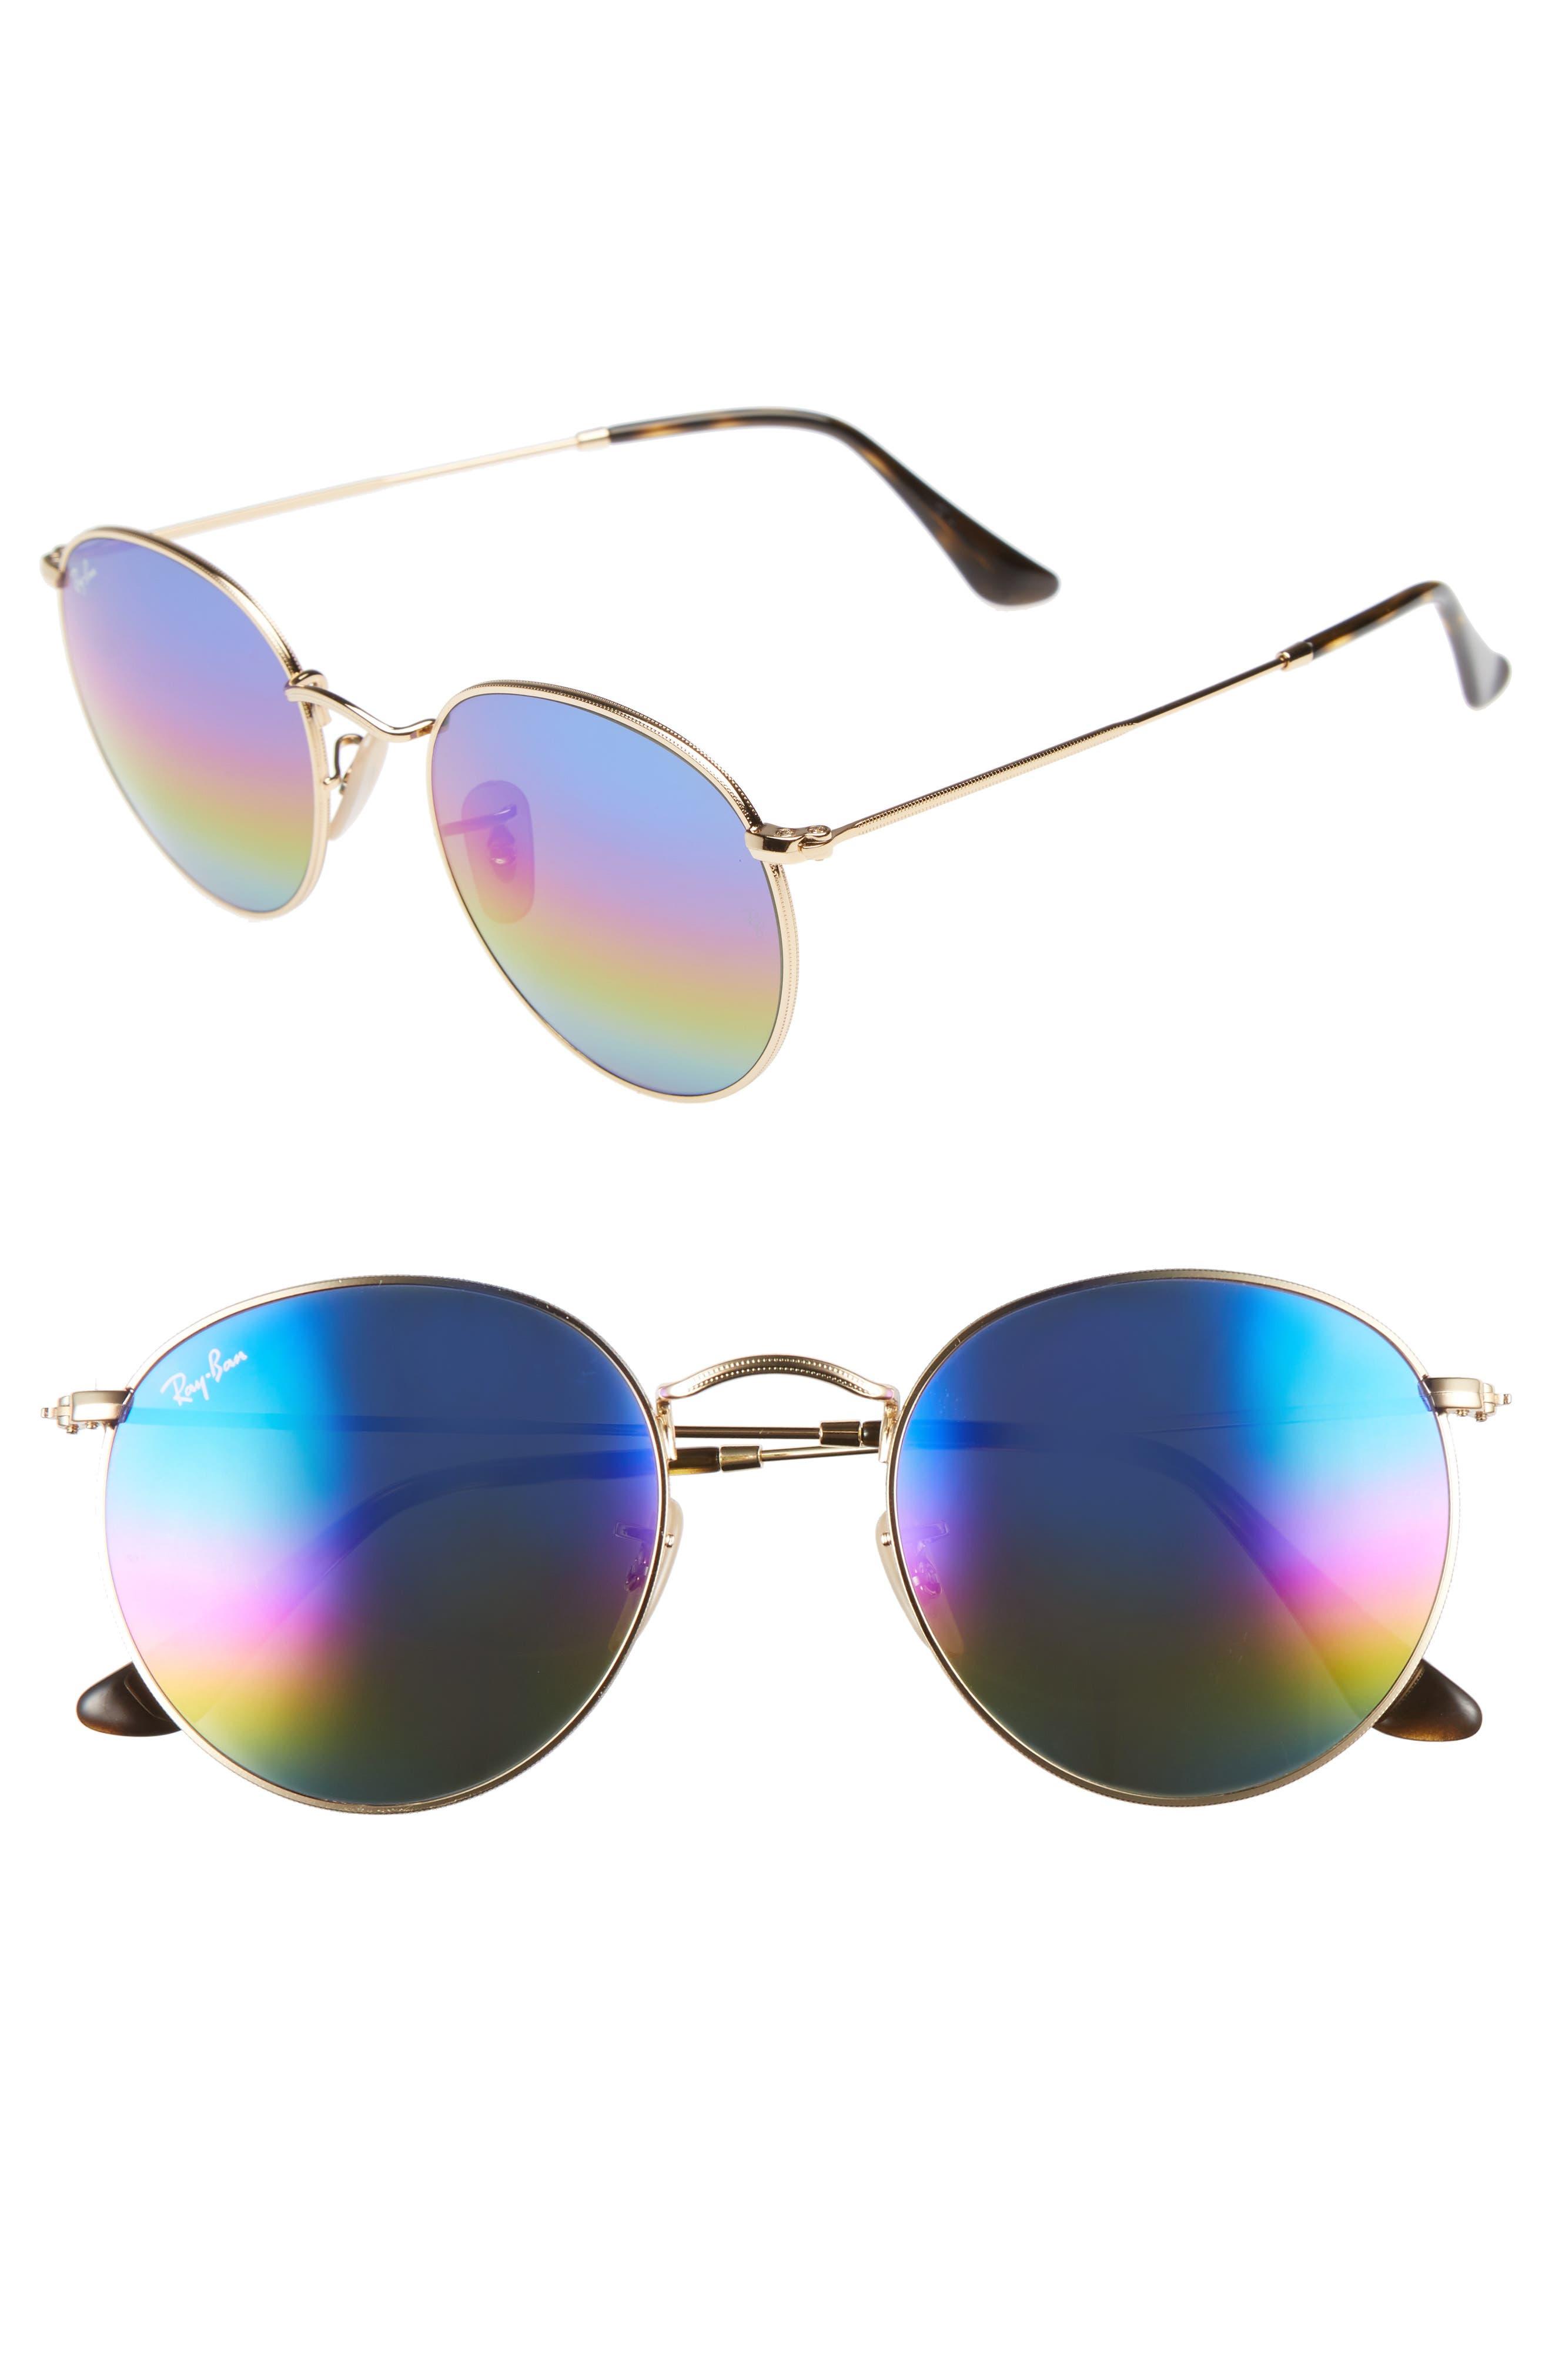 53mm Round Sunglasses,                         Main,                         color, Blue/ Multi